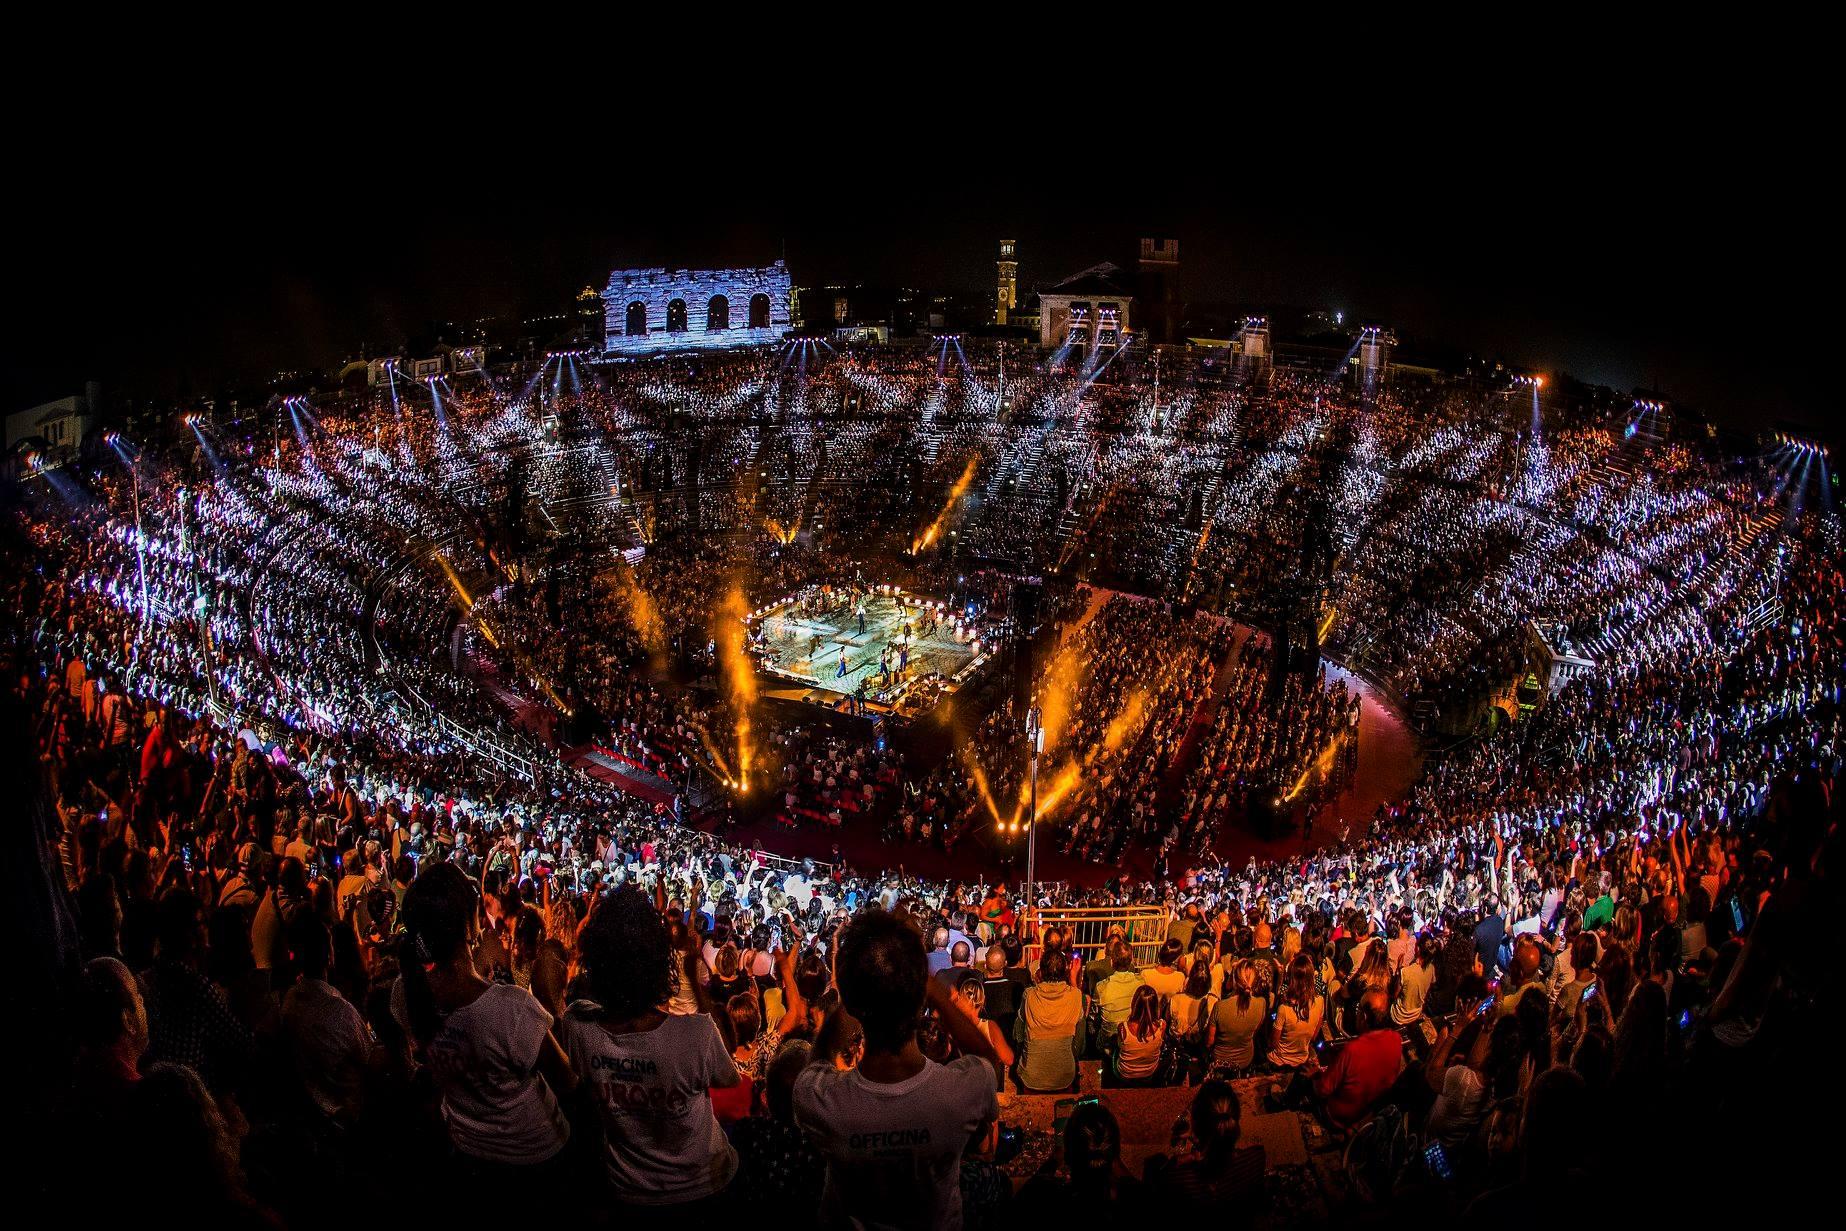 claudio baglioni arena di verona italia italy 50 al centro highline trickline show funambule circus performance spectacle suisse Slackline Lyell Grunberg  (2).jpg